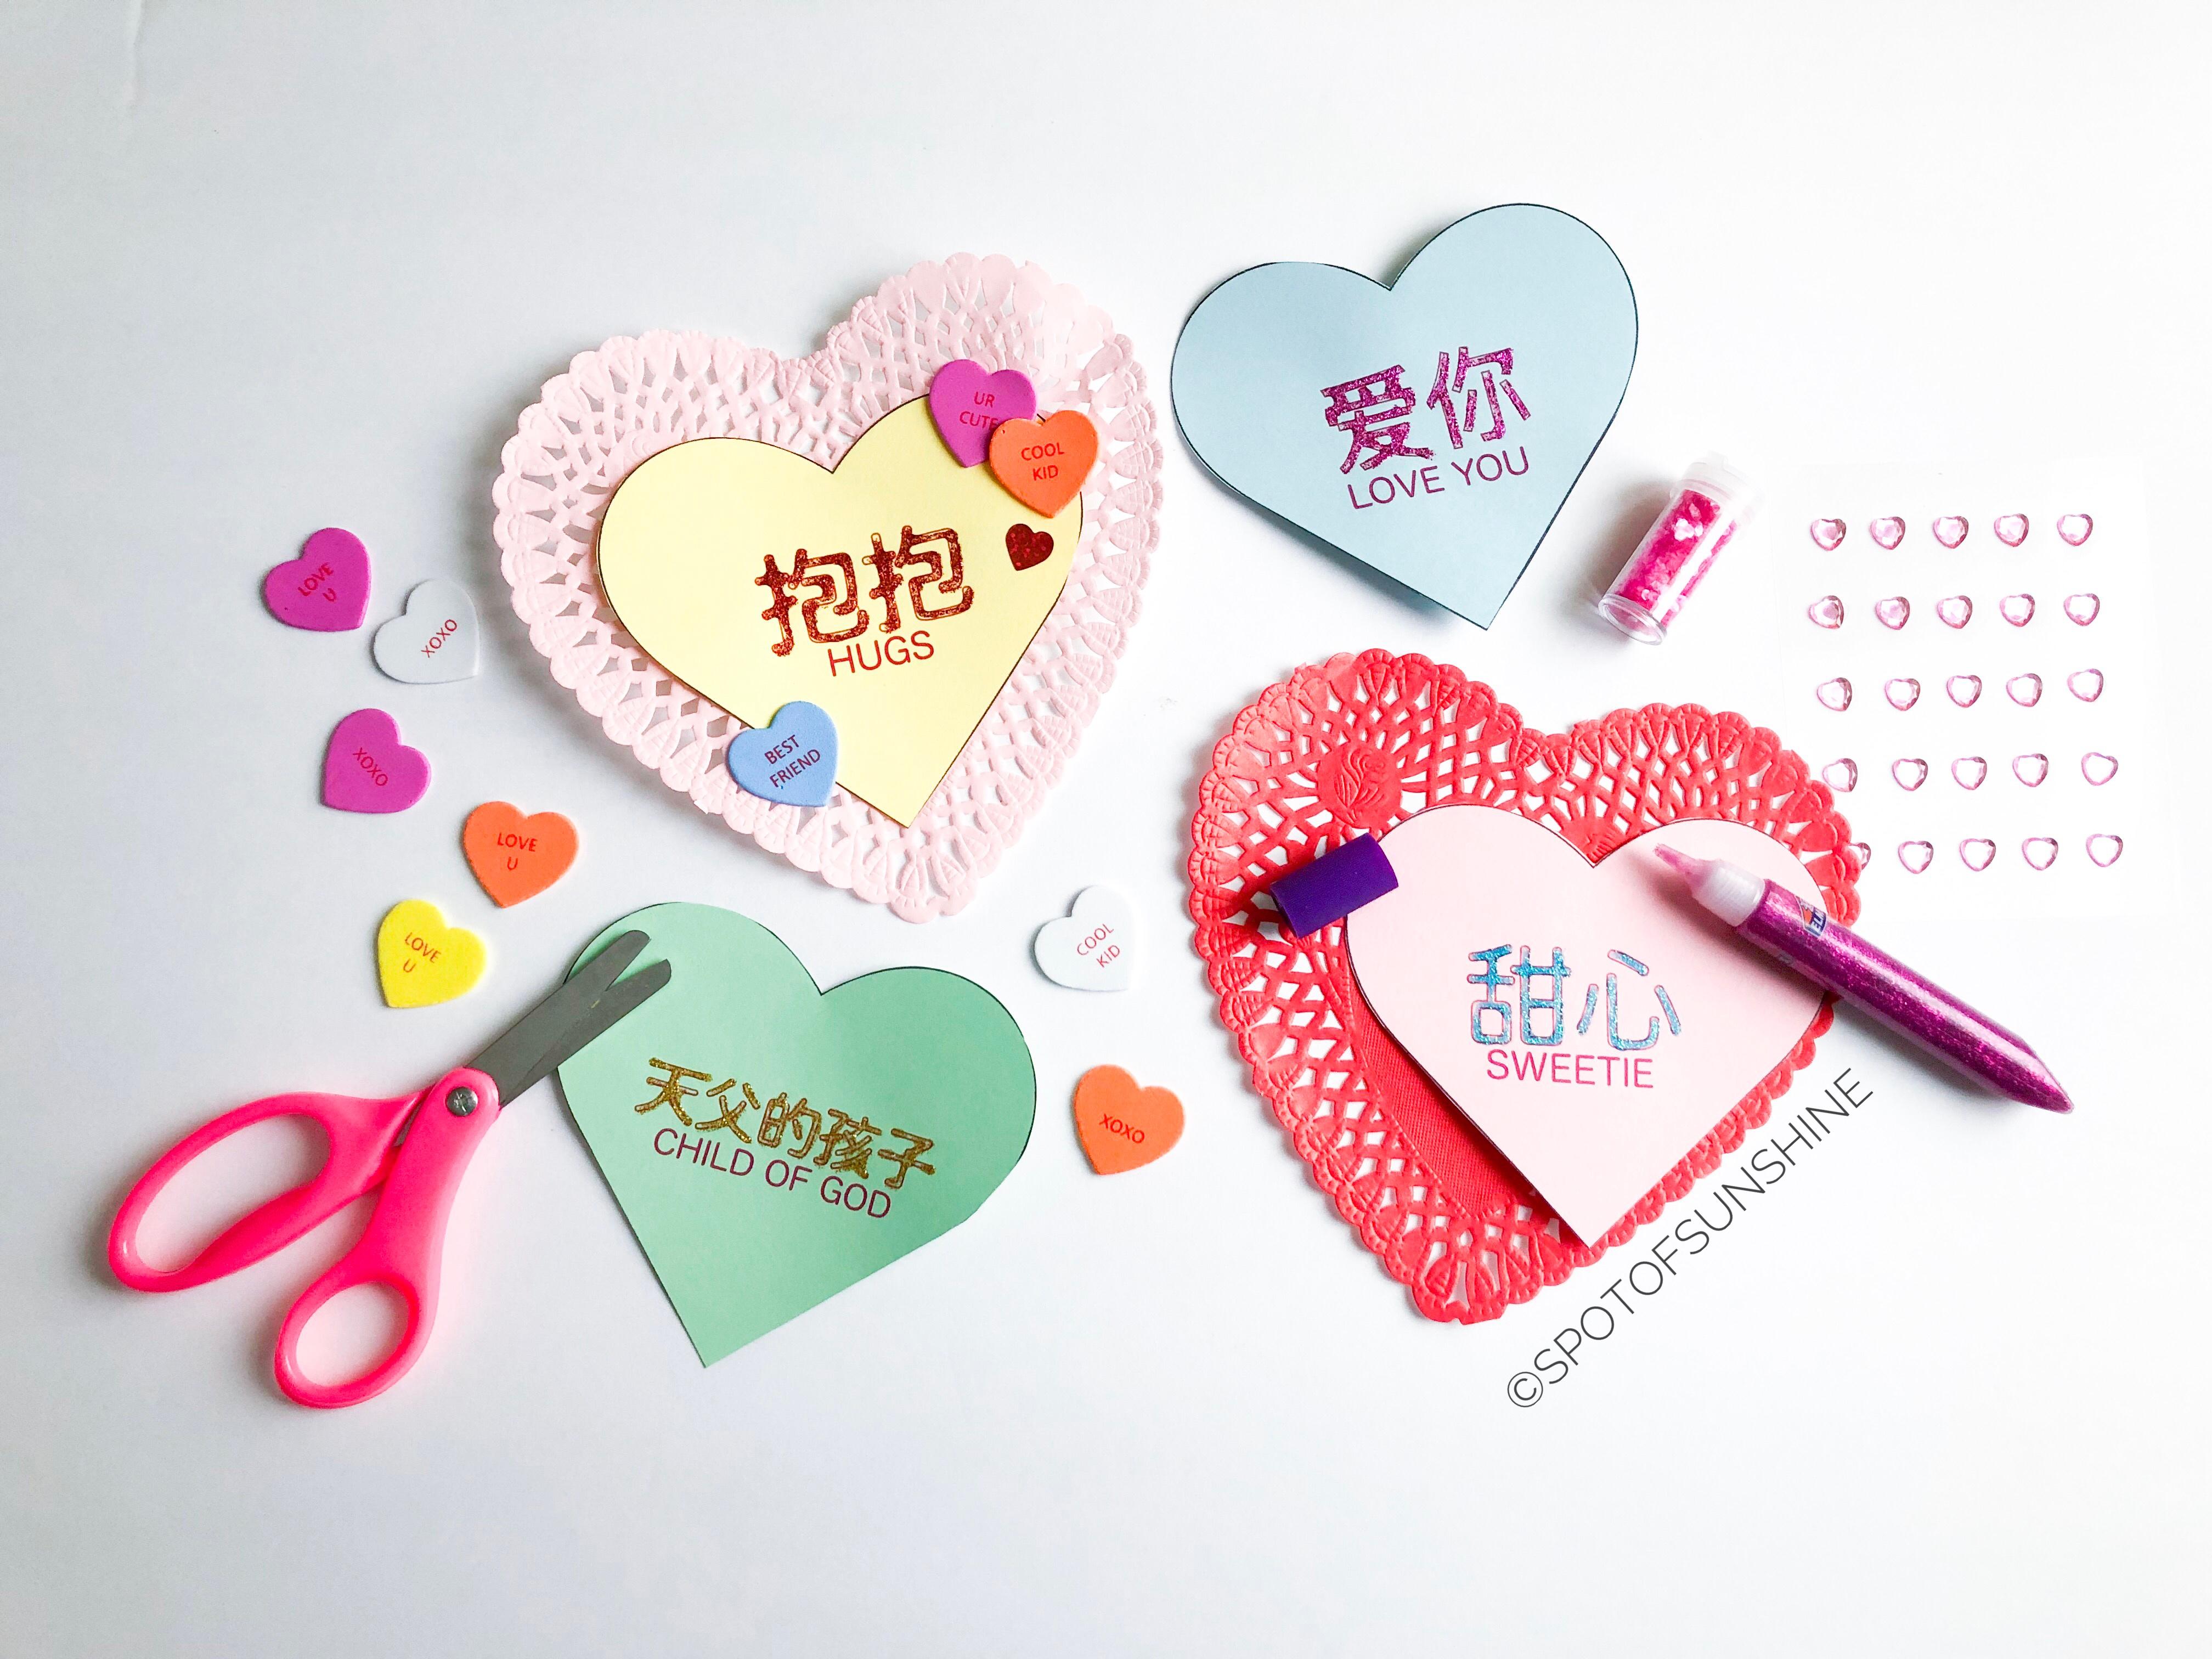 learn Chinese Mandarin kids children toddlers preschool DIY Valentine's day cards 情人節卡片DIY 兒童 基督徒 Christian crafts